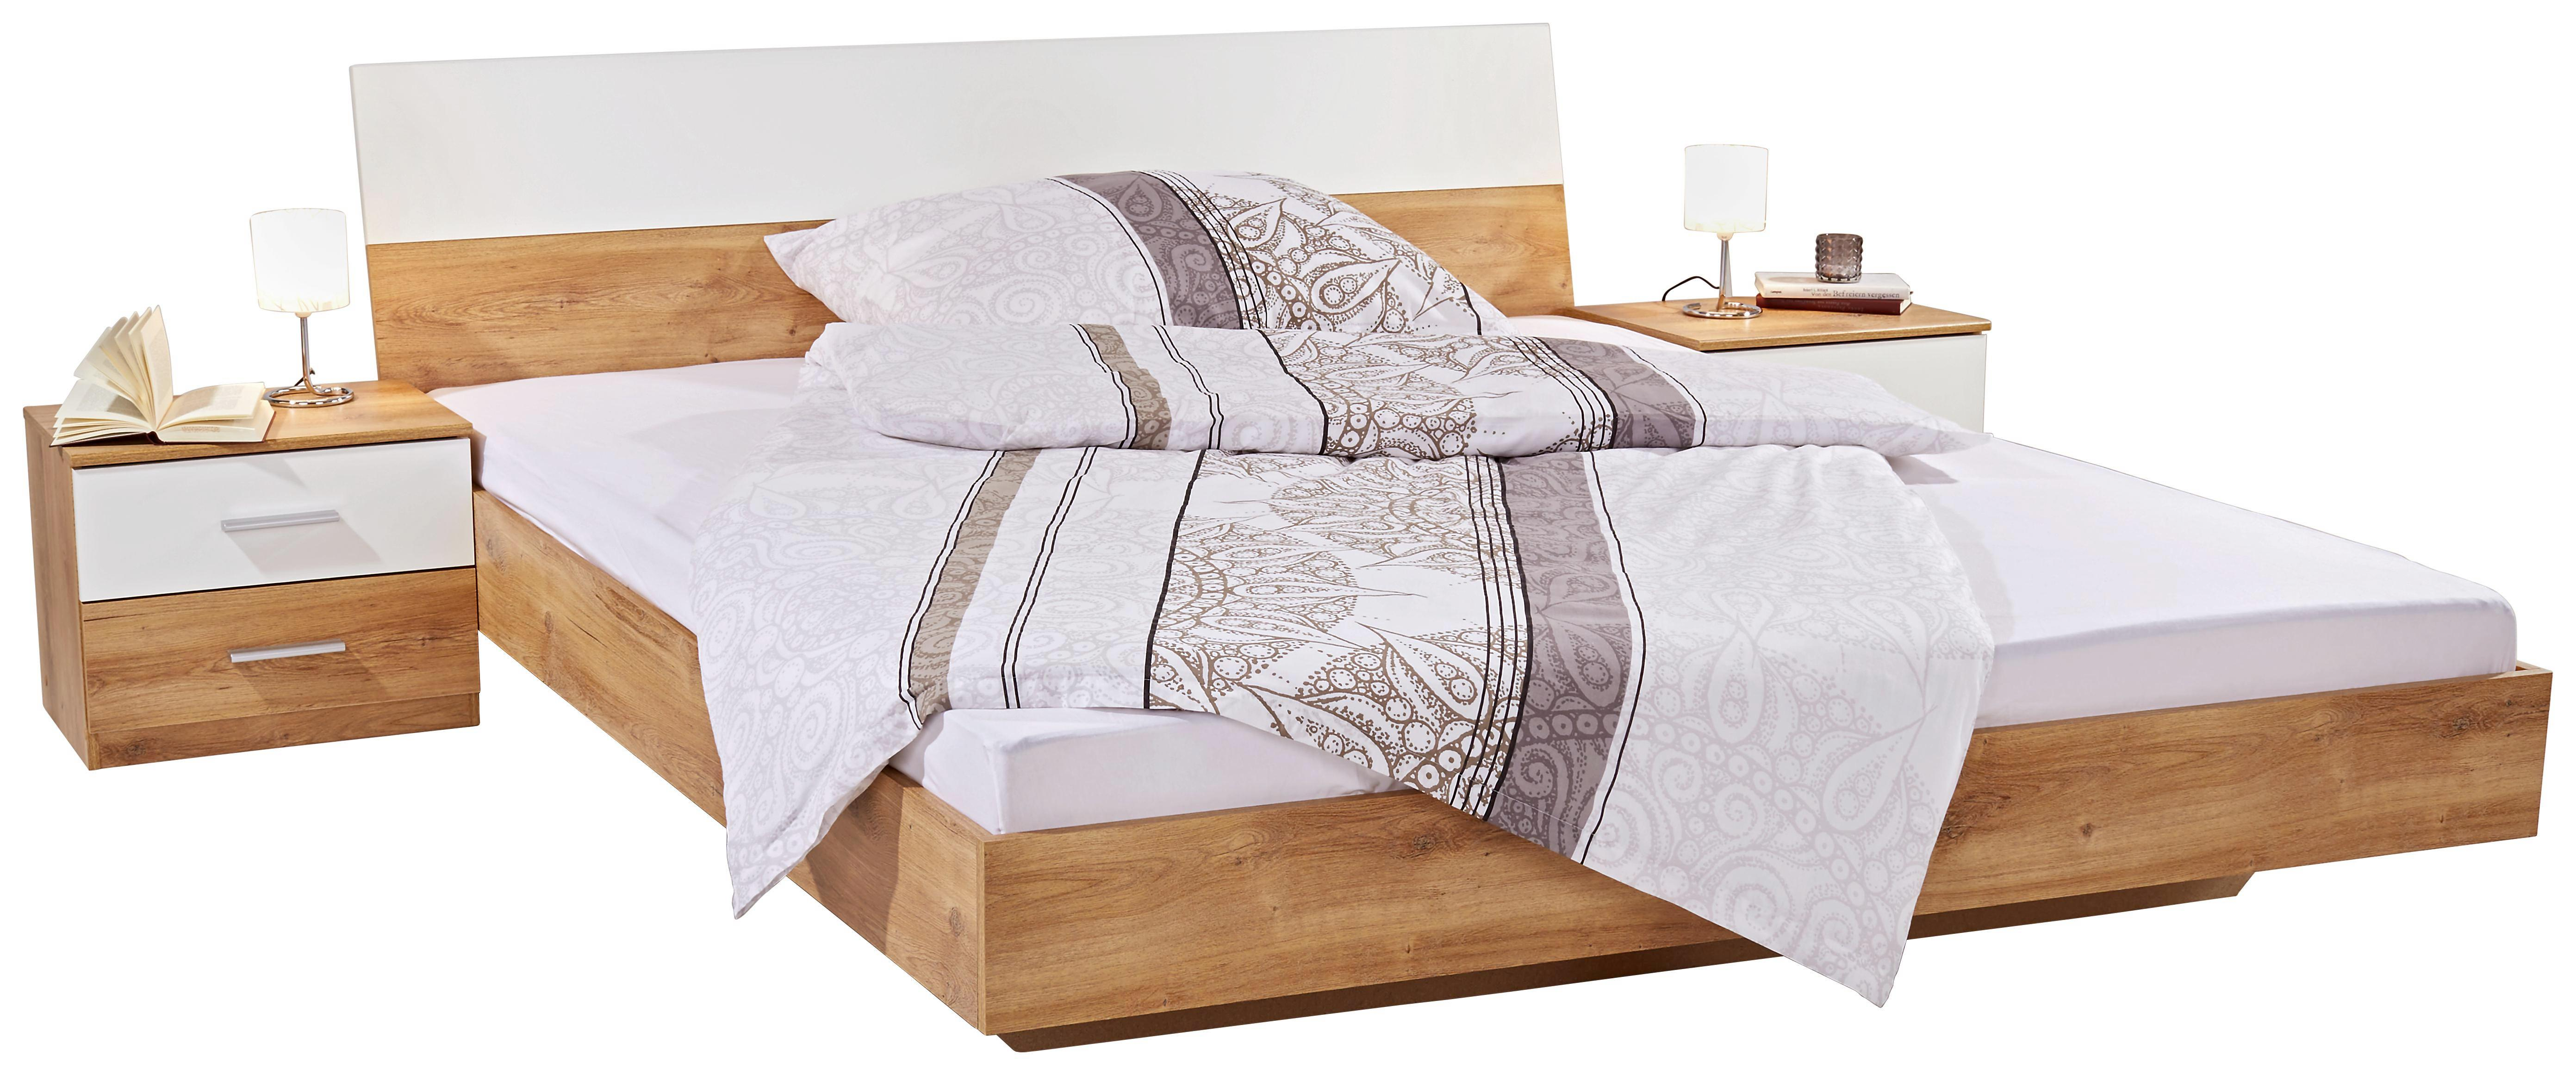 Schlafzimmer Katrin Bett